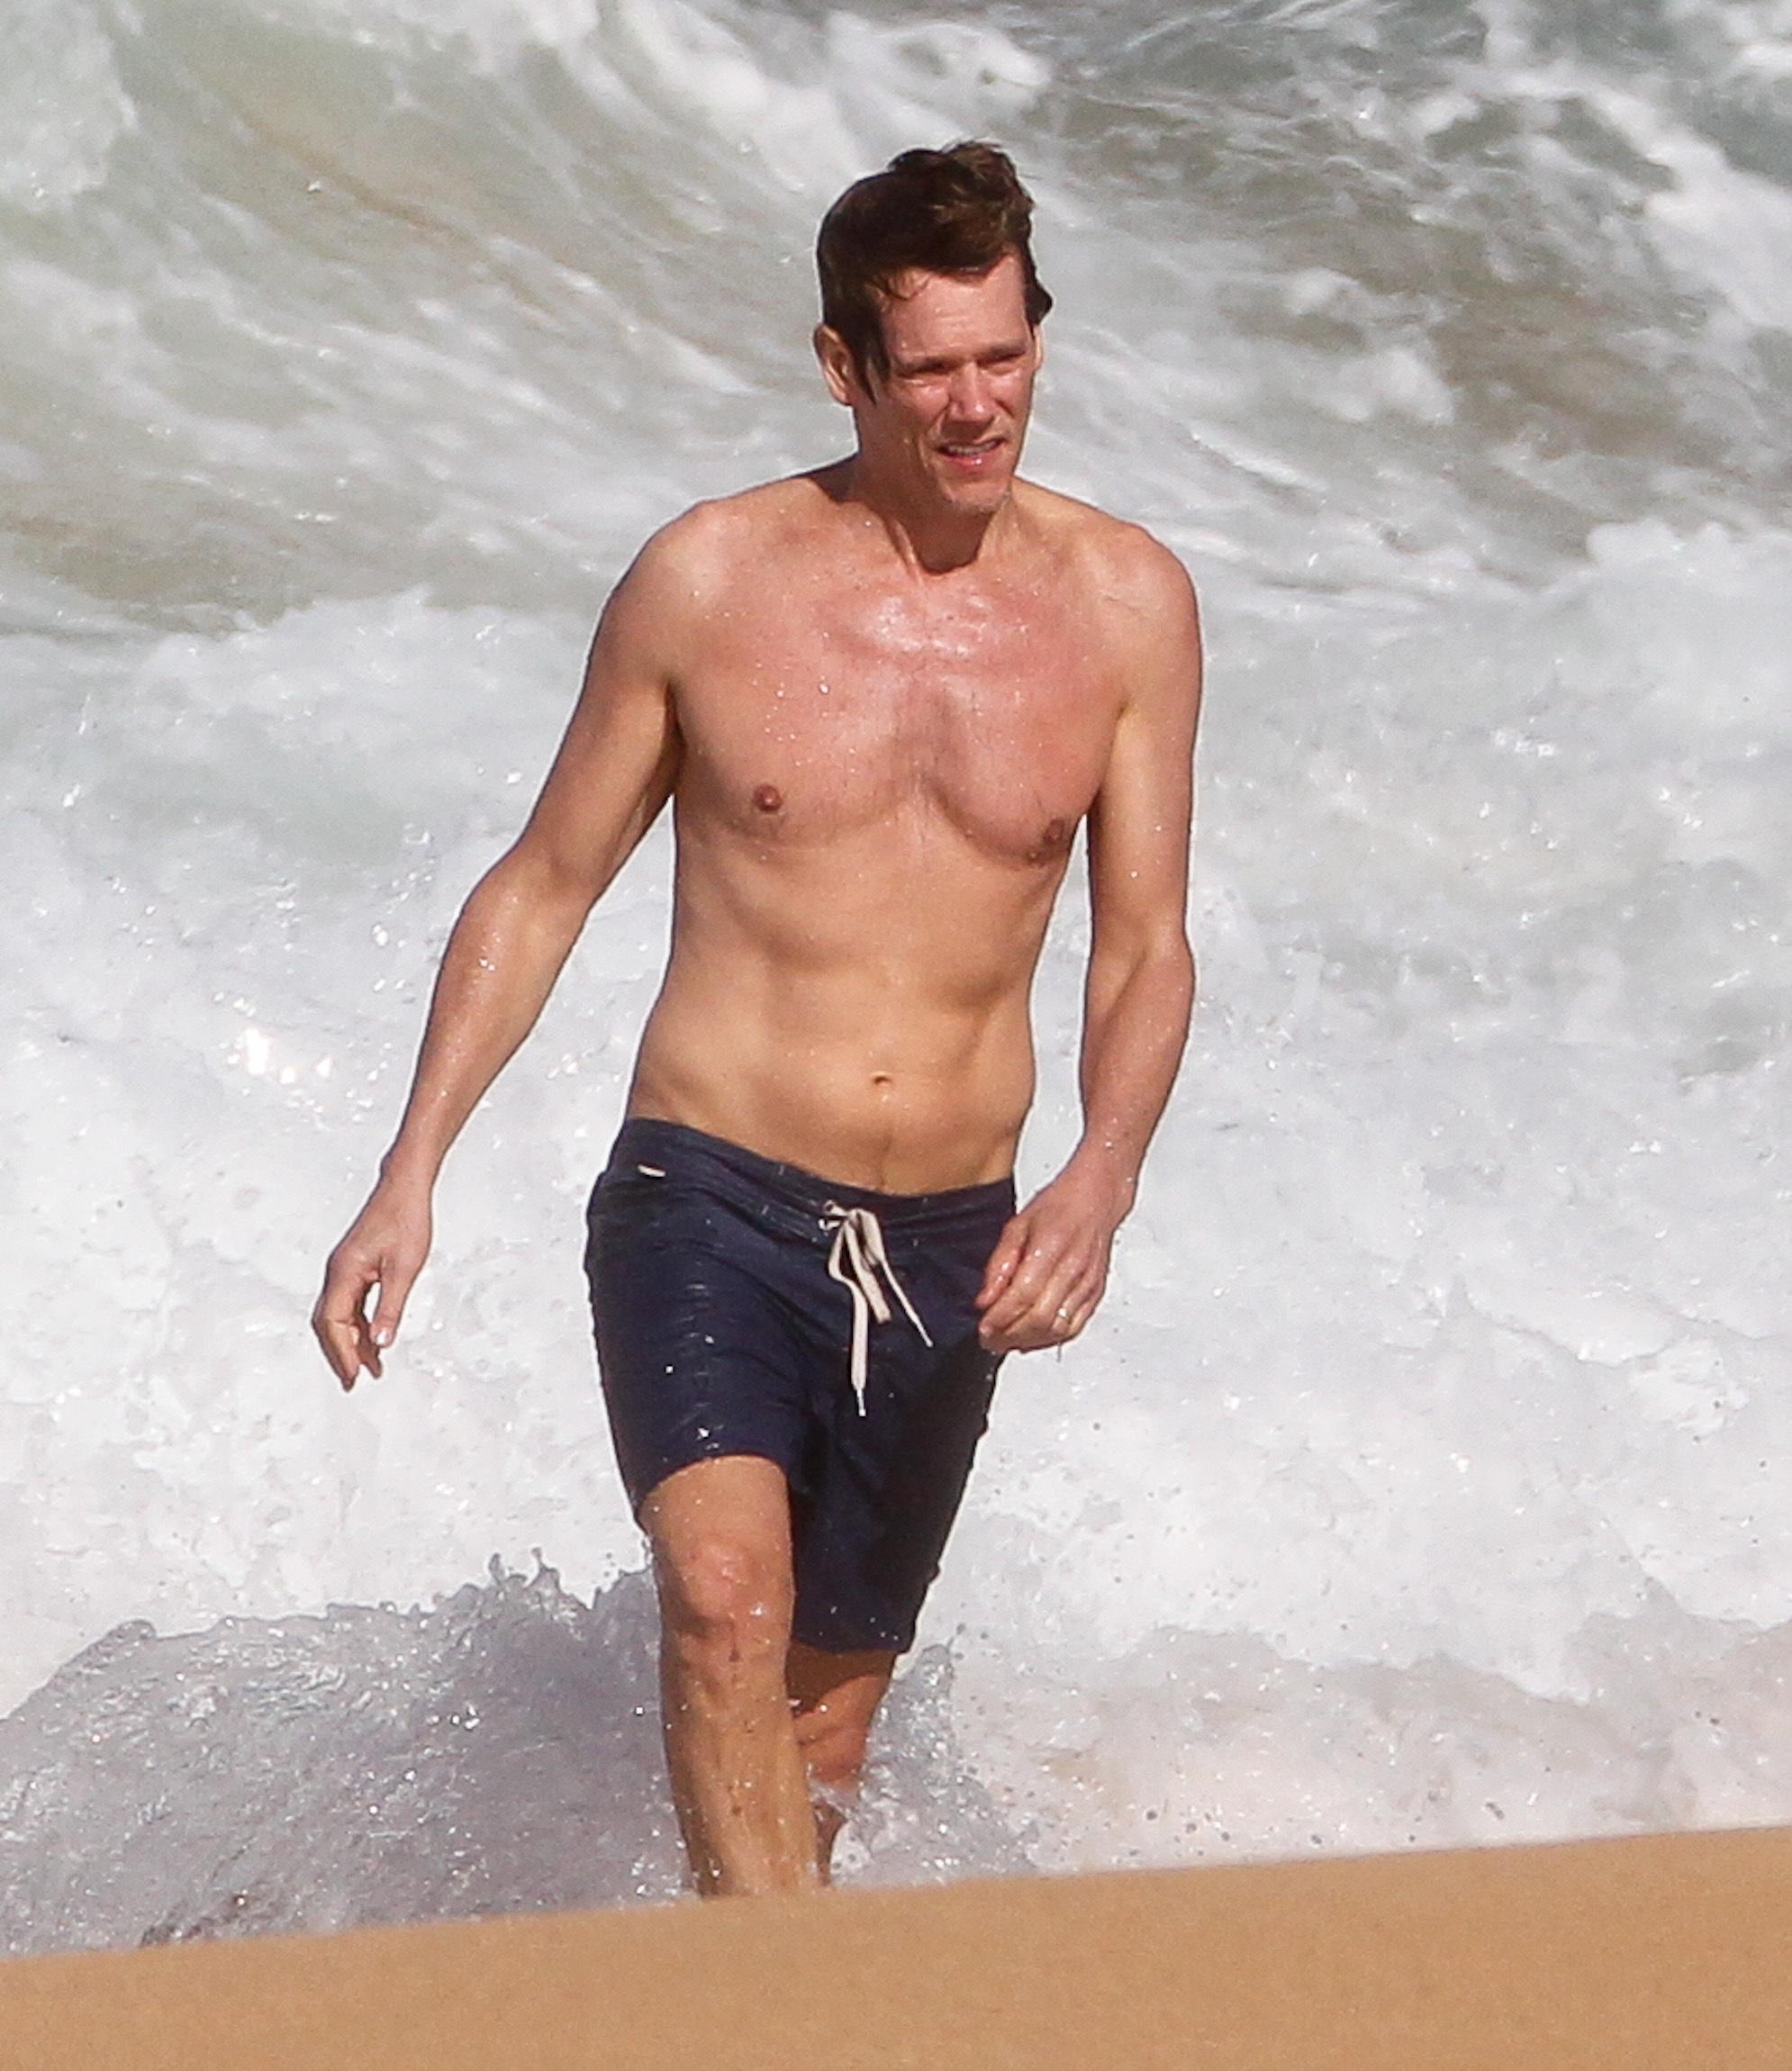 kevin bacon Shirtless male men celebrity hunks dudes